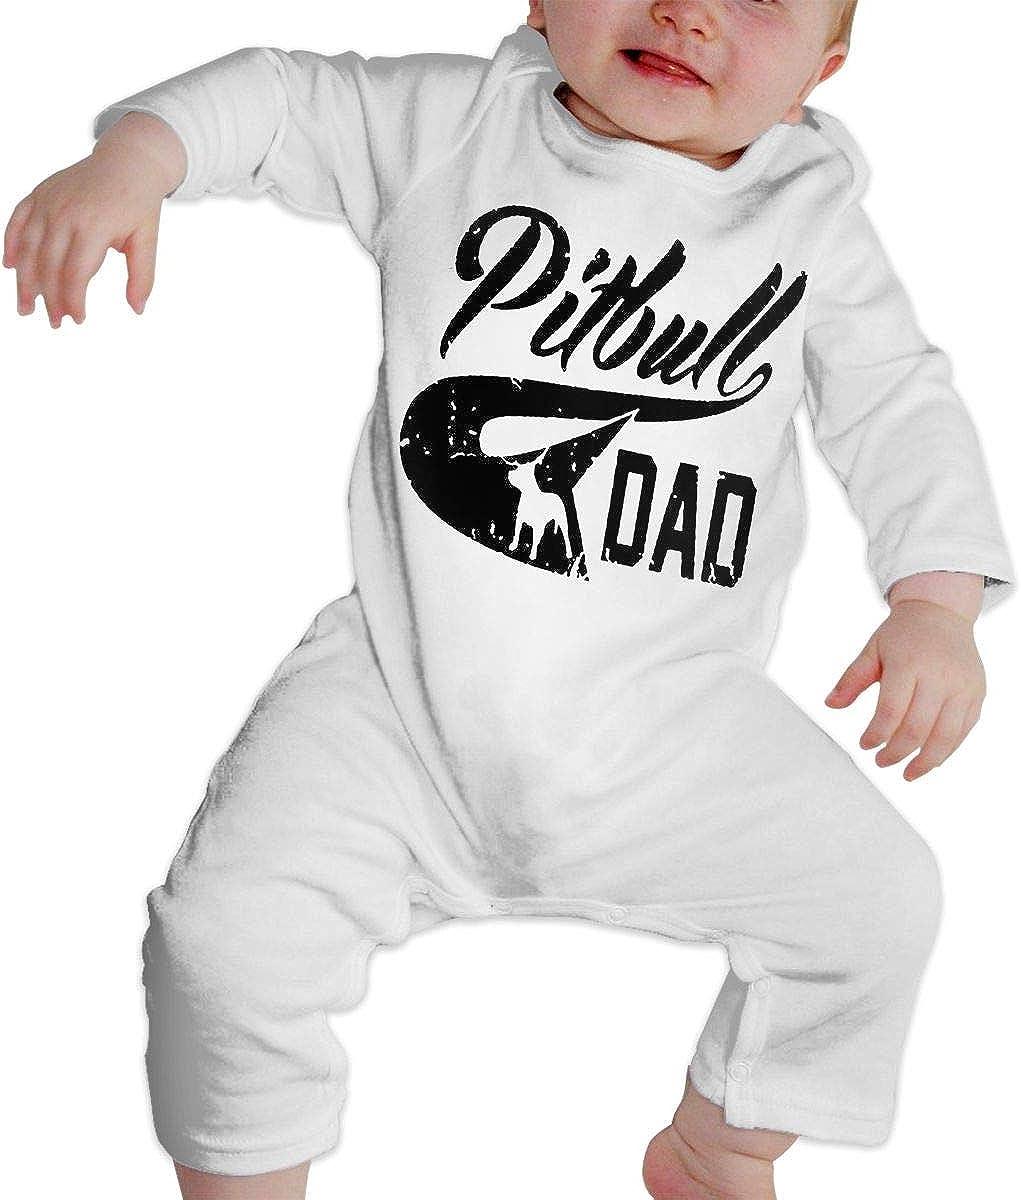 Dinosaur On Skateboard Newborn Baby Girl Infant Organic Cotton Bodysuit Jumpsuit Outfits